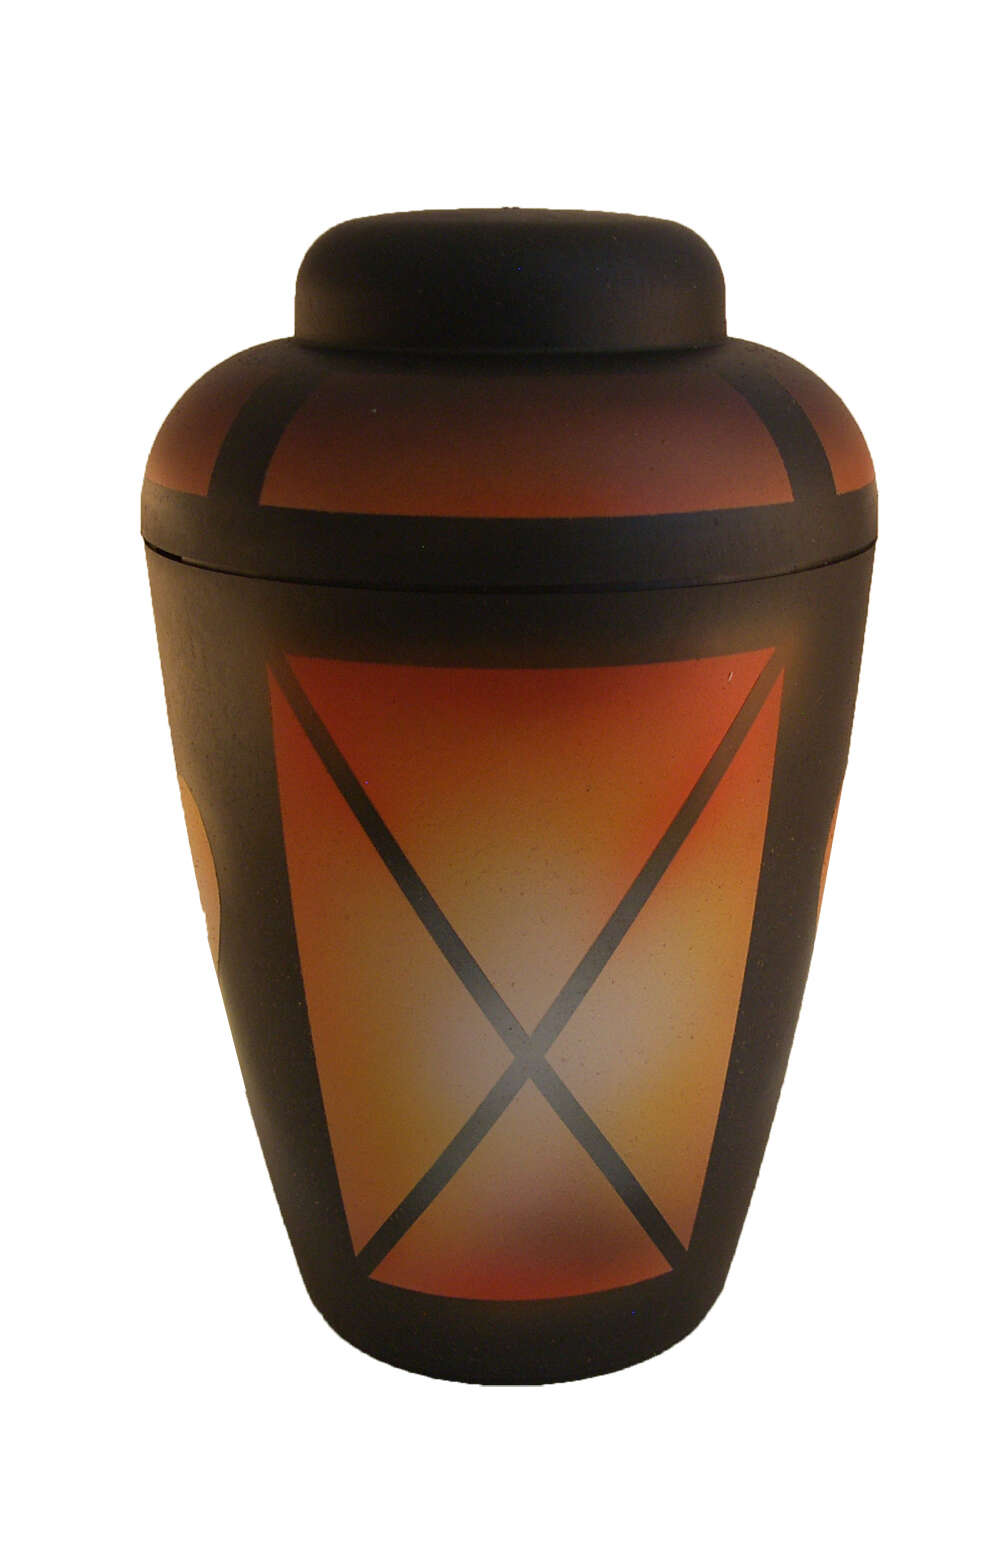 en BAS1310 airbrush funeral urn for human ashes orange black gold biodigradable urn